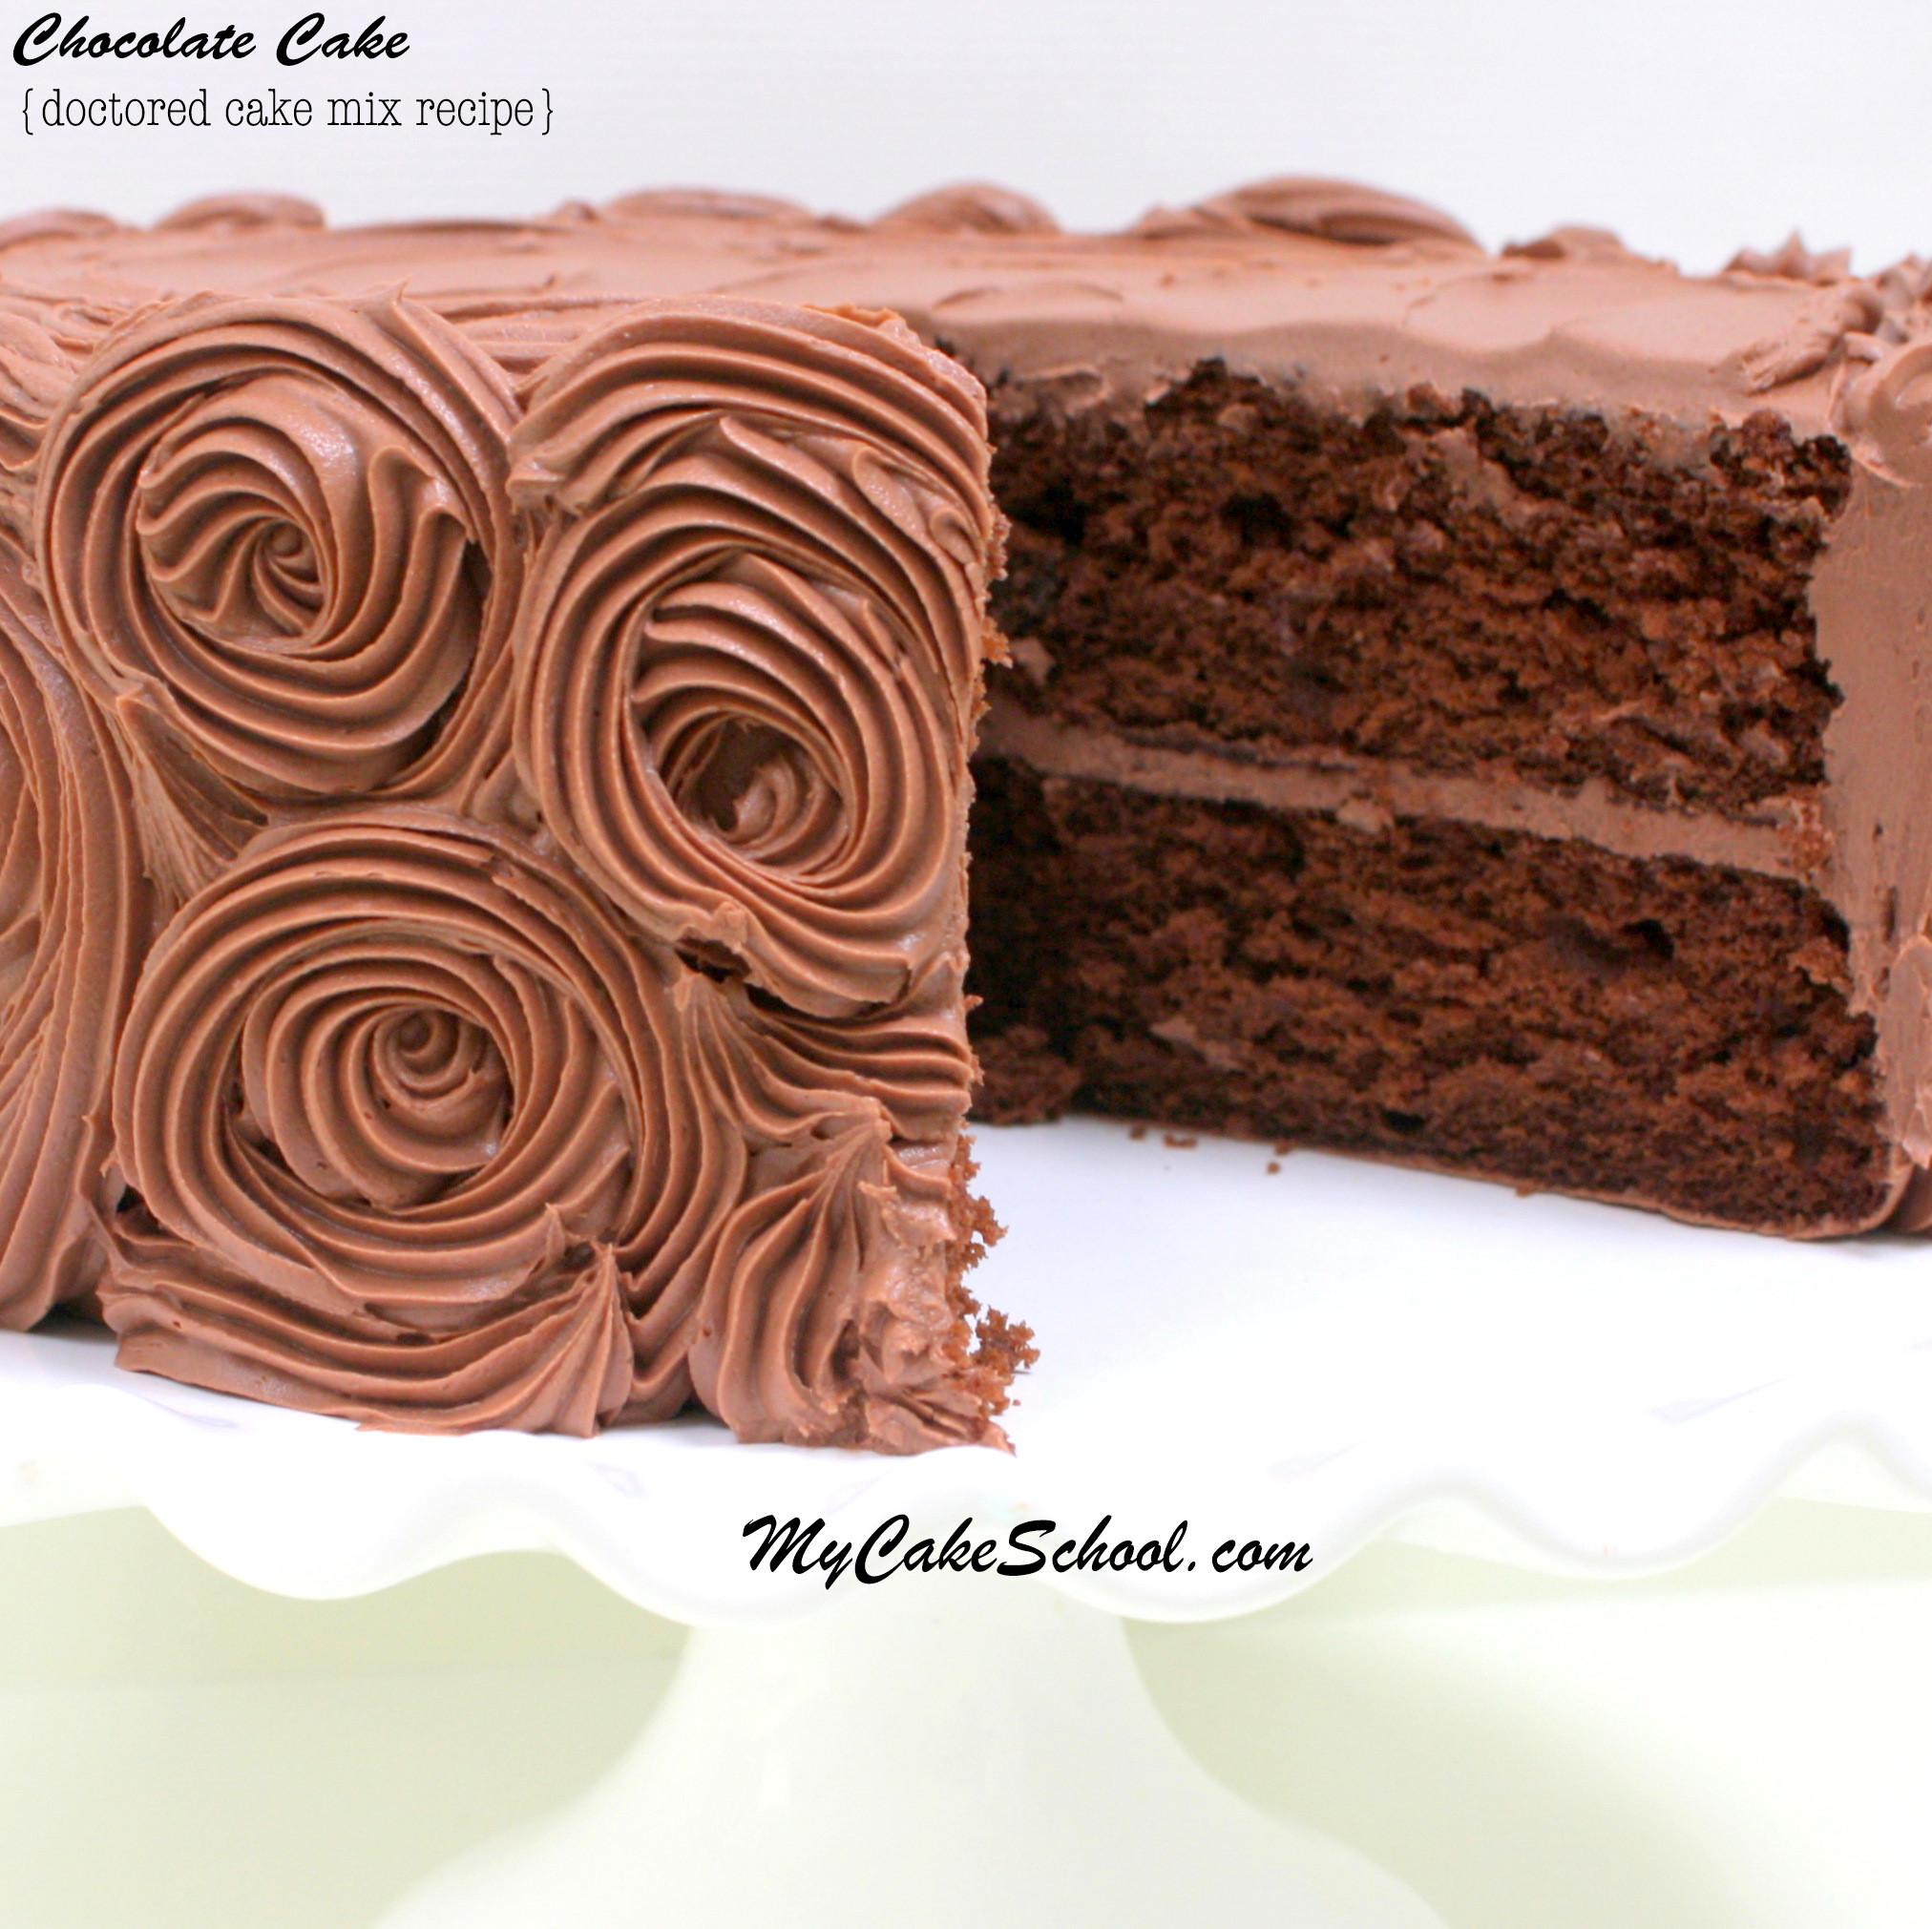 Chocolate Cake Mix Recipes  Chocolate Cake A Doctored Mix Recipe